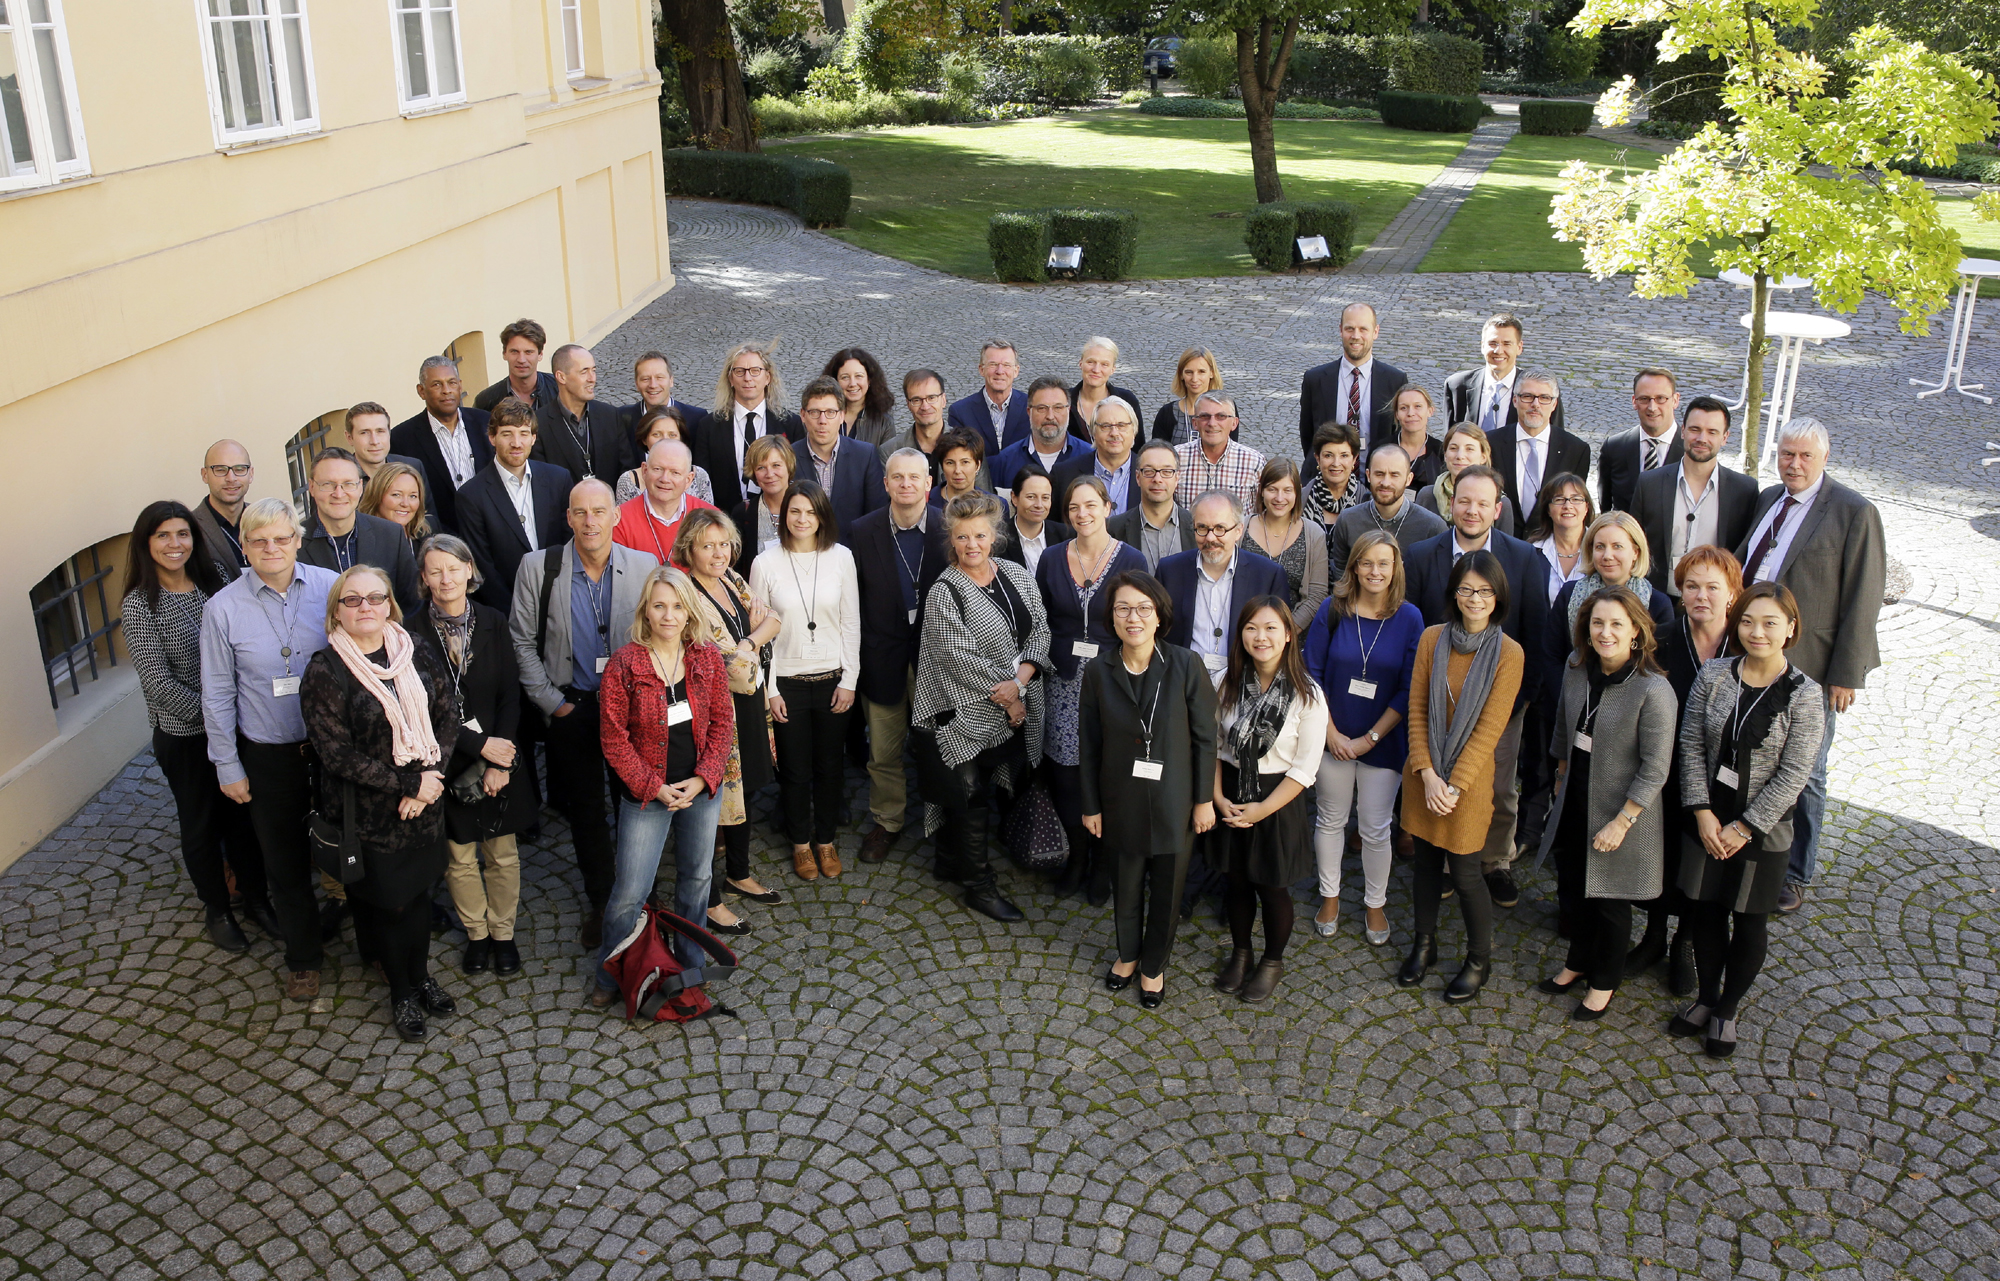 ICC Berlin 2015: Gruppenbild aller Teilnehmer © photothek.net/Thomas Koehler